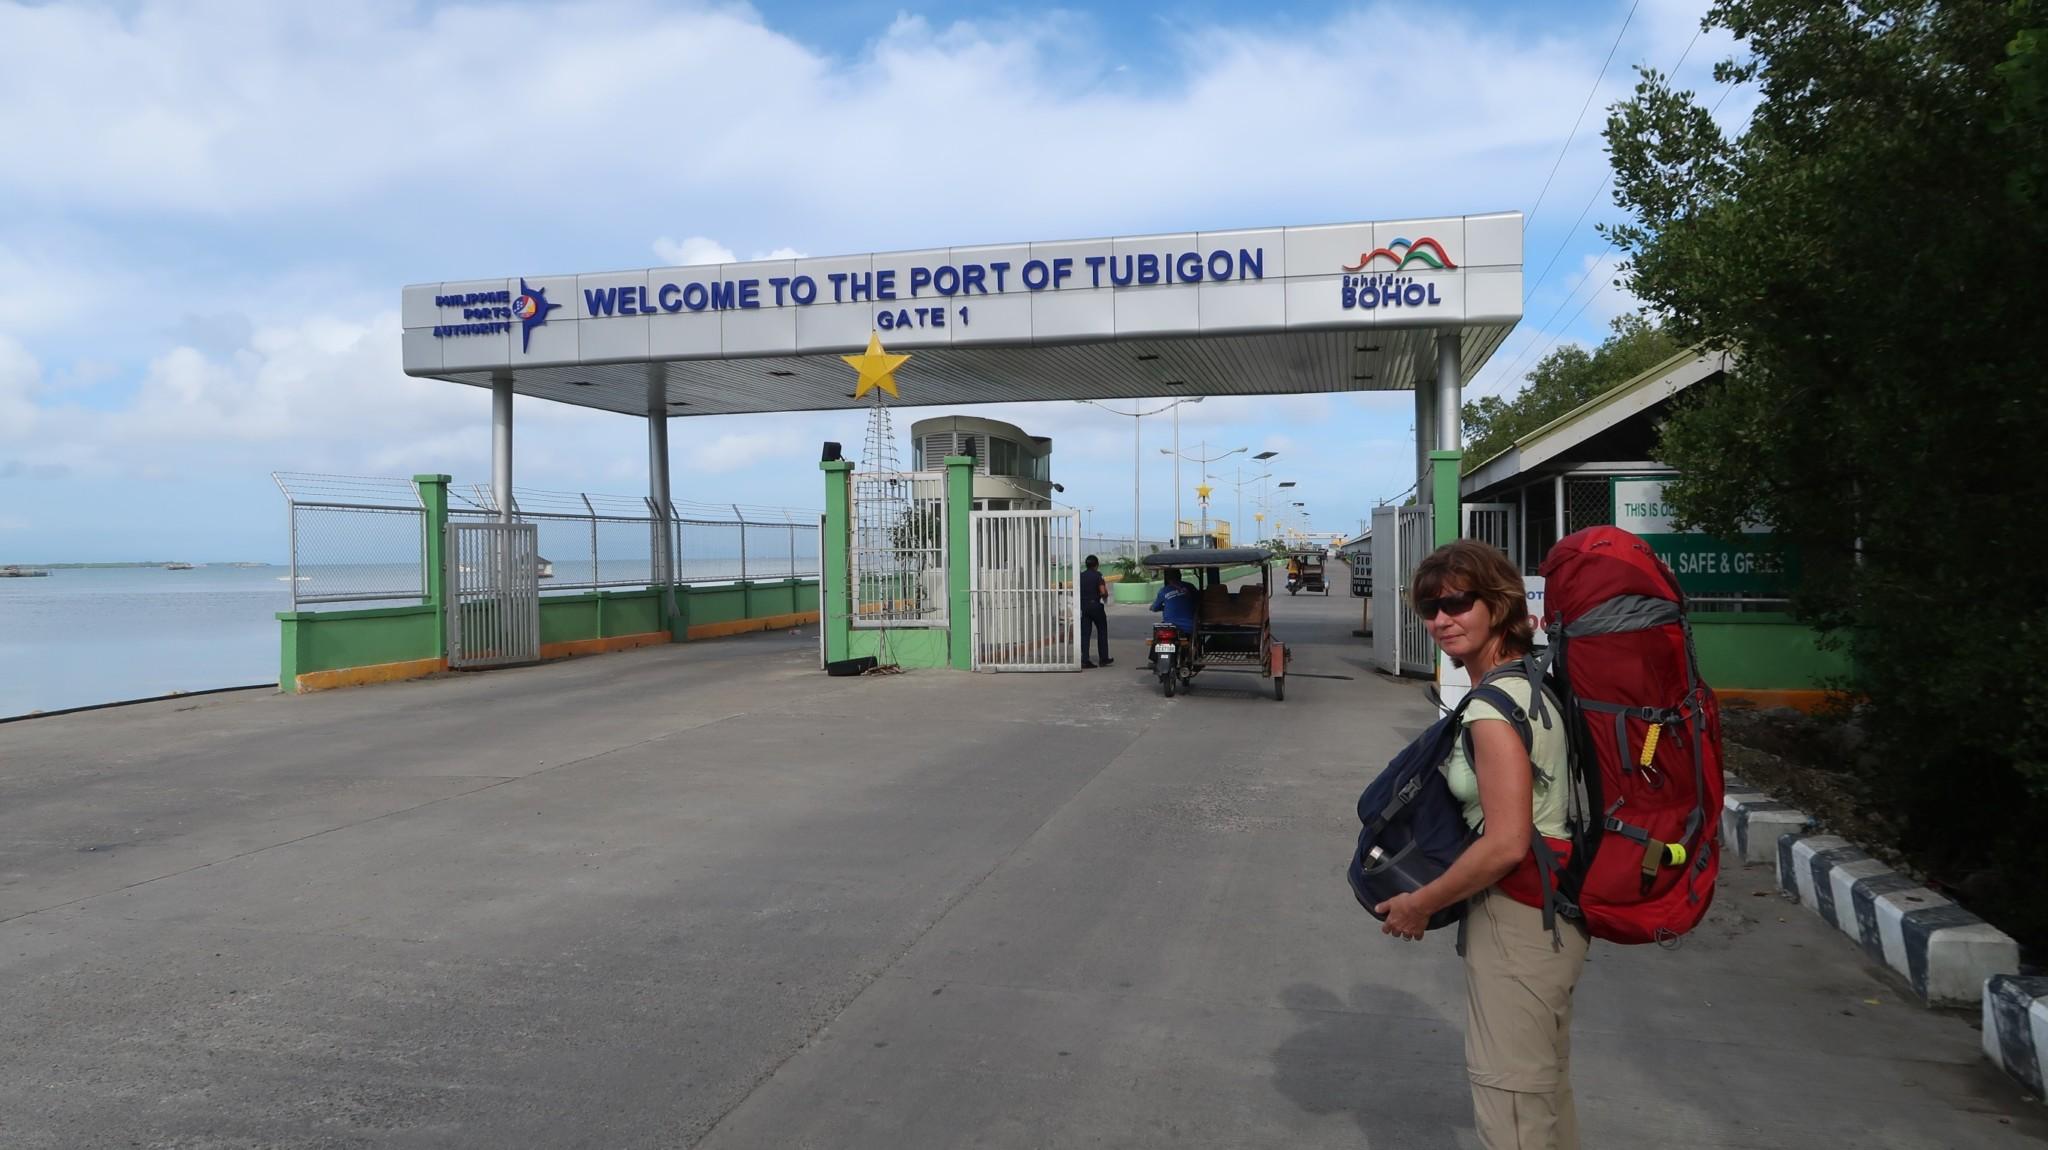 Pier in Tubigon auf der Insel Bohol